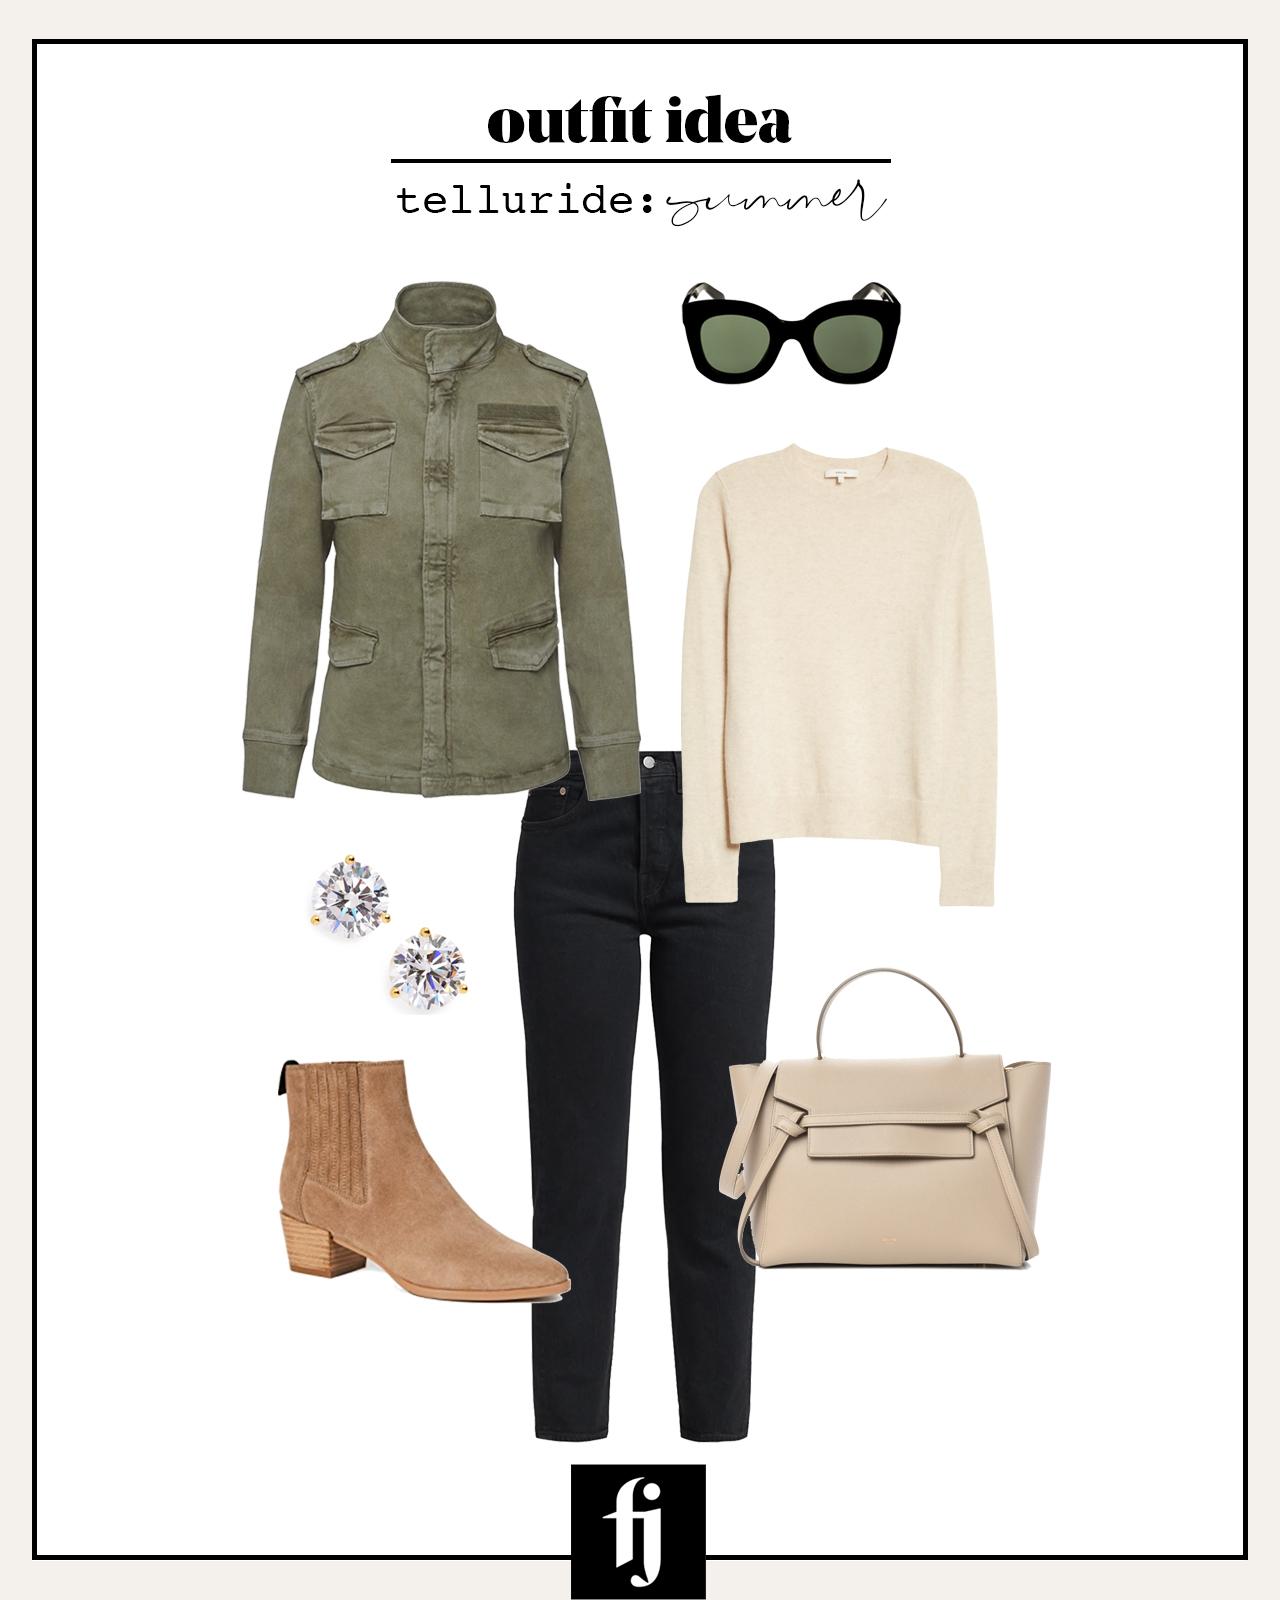 telluride summer outfit idea 1